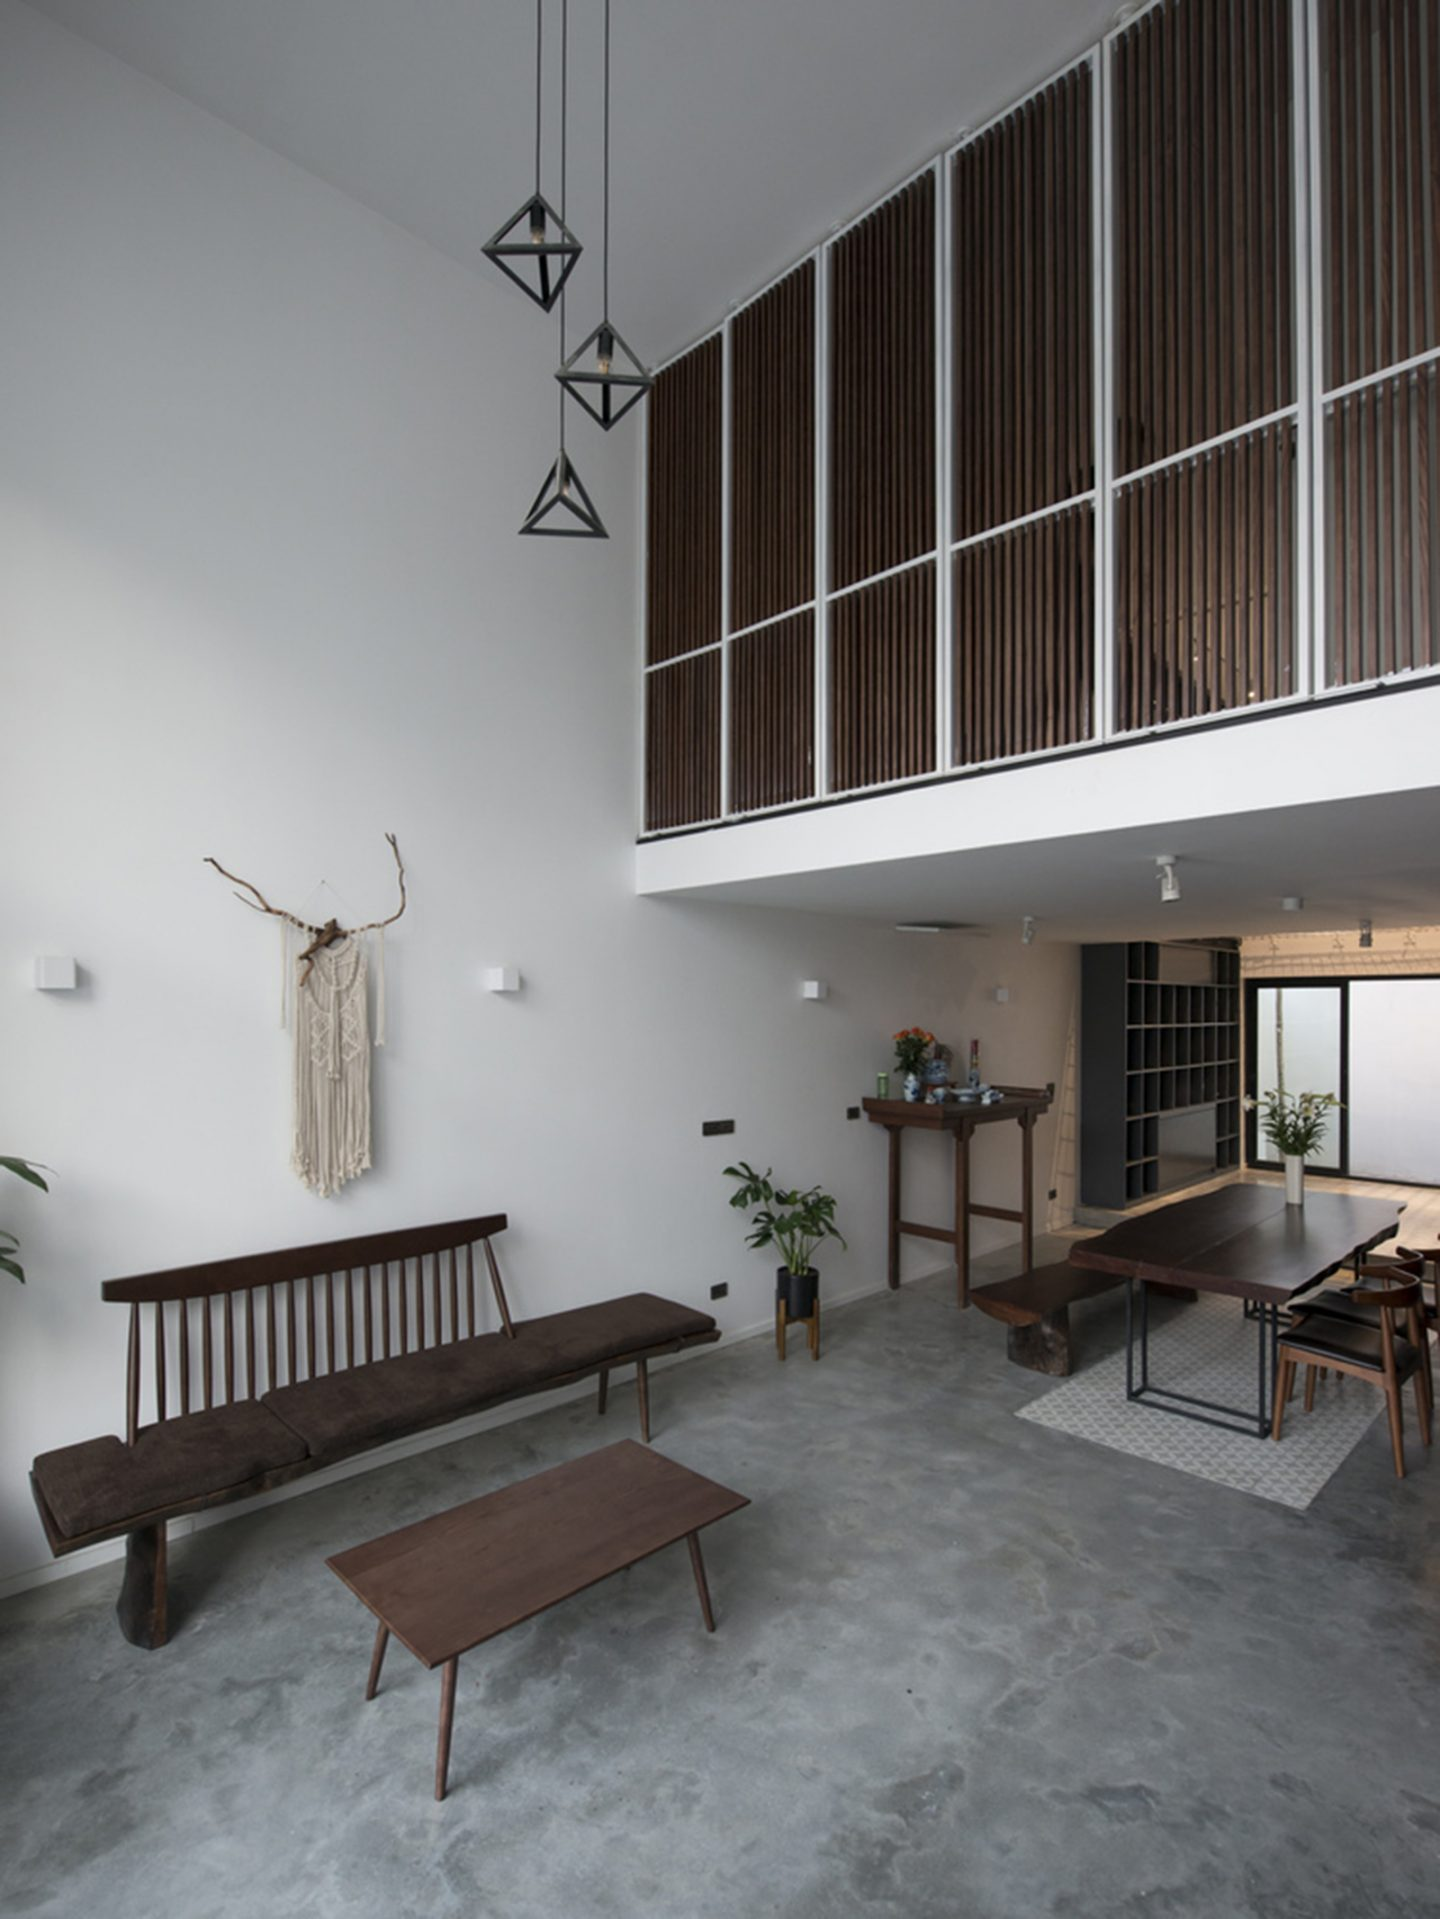 iGNANT-Architecture-Toob-Studios-5x12House-001